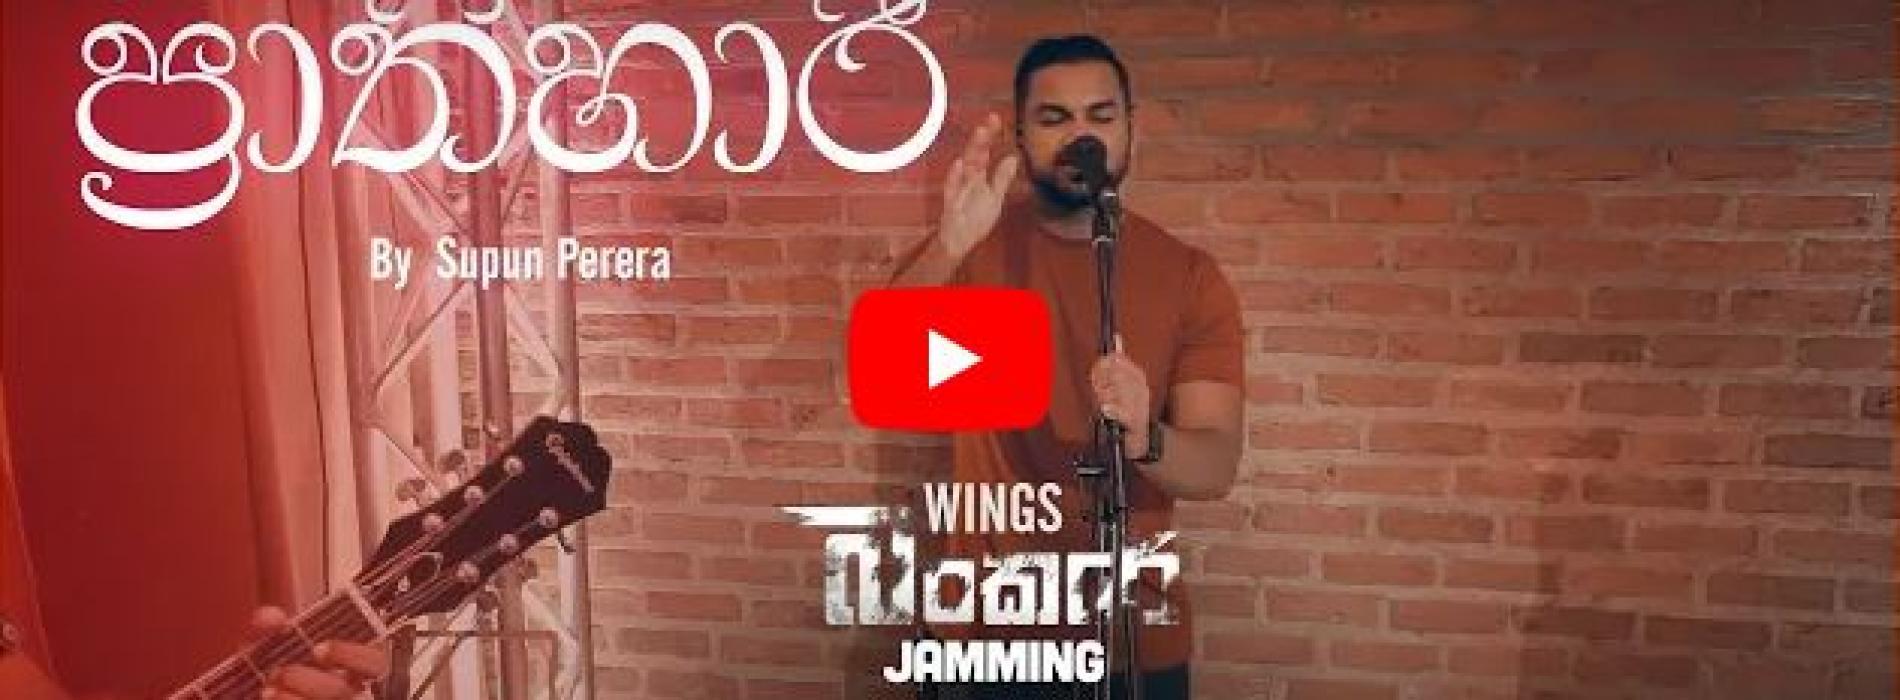 New Music : Prathihari | Supun Perera ft WINGS | Bunker Sessions (Season 2) | Ep-08 (Live Acoustic Version)